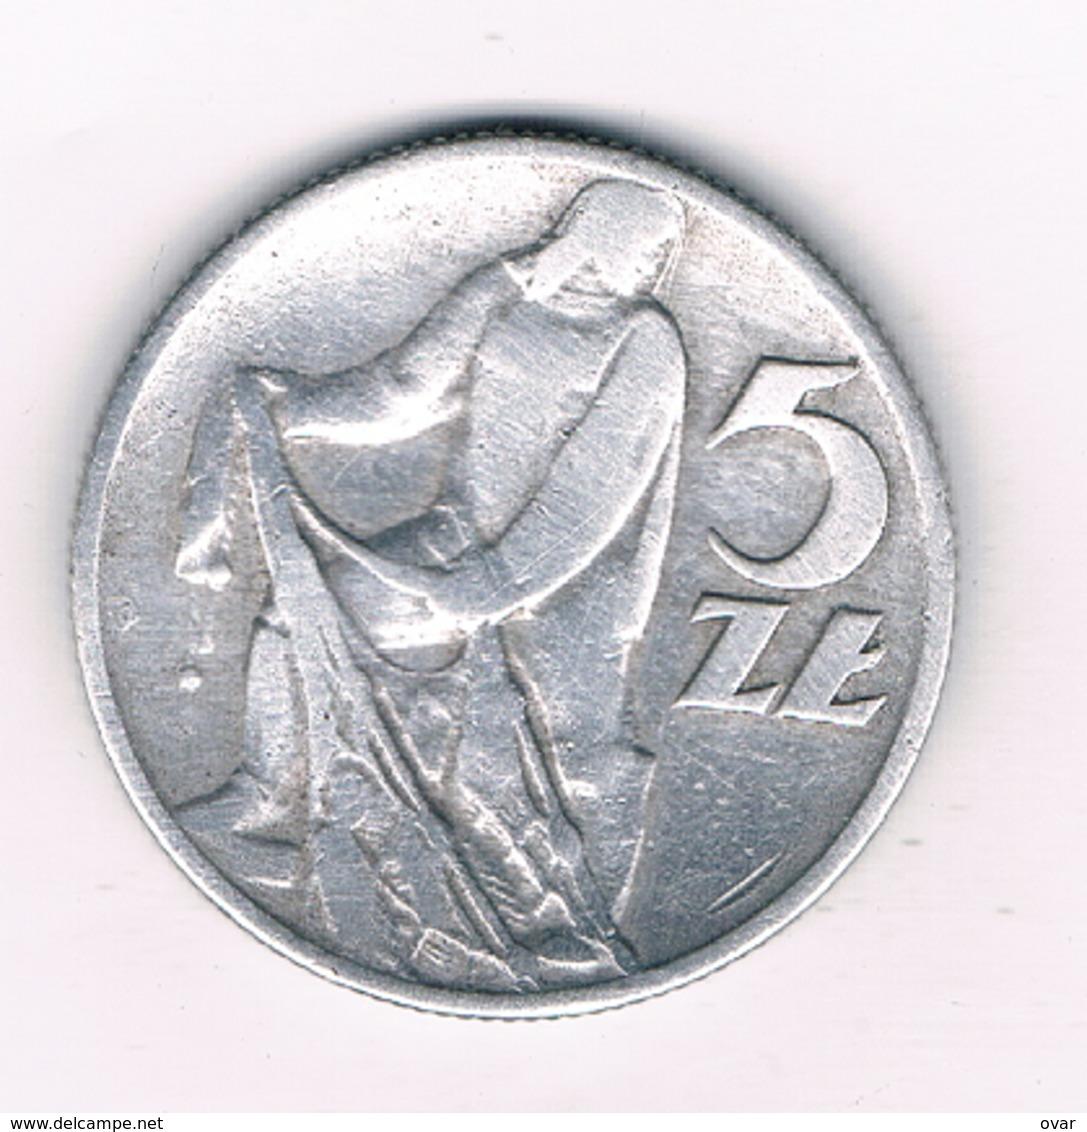 5 ZLOTYCH 1959 POLEN /3183/ - Poland